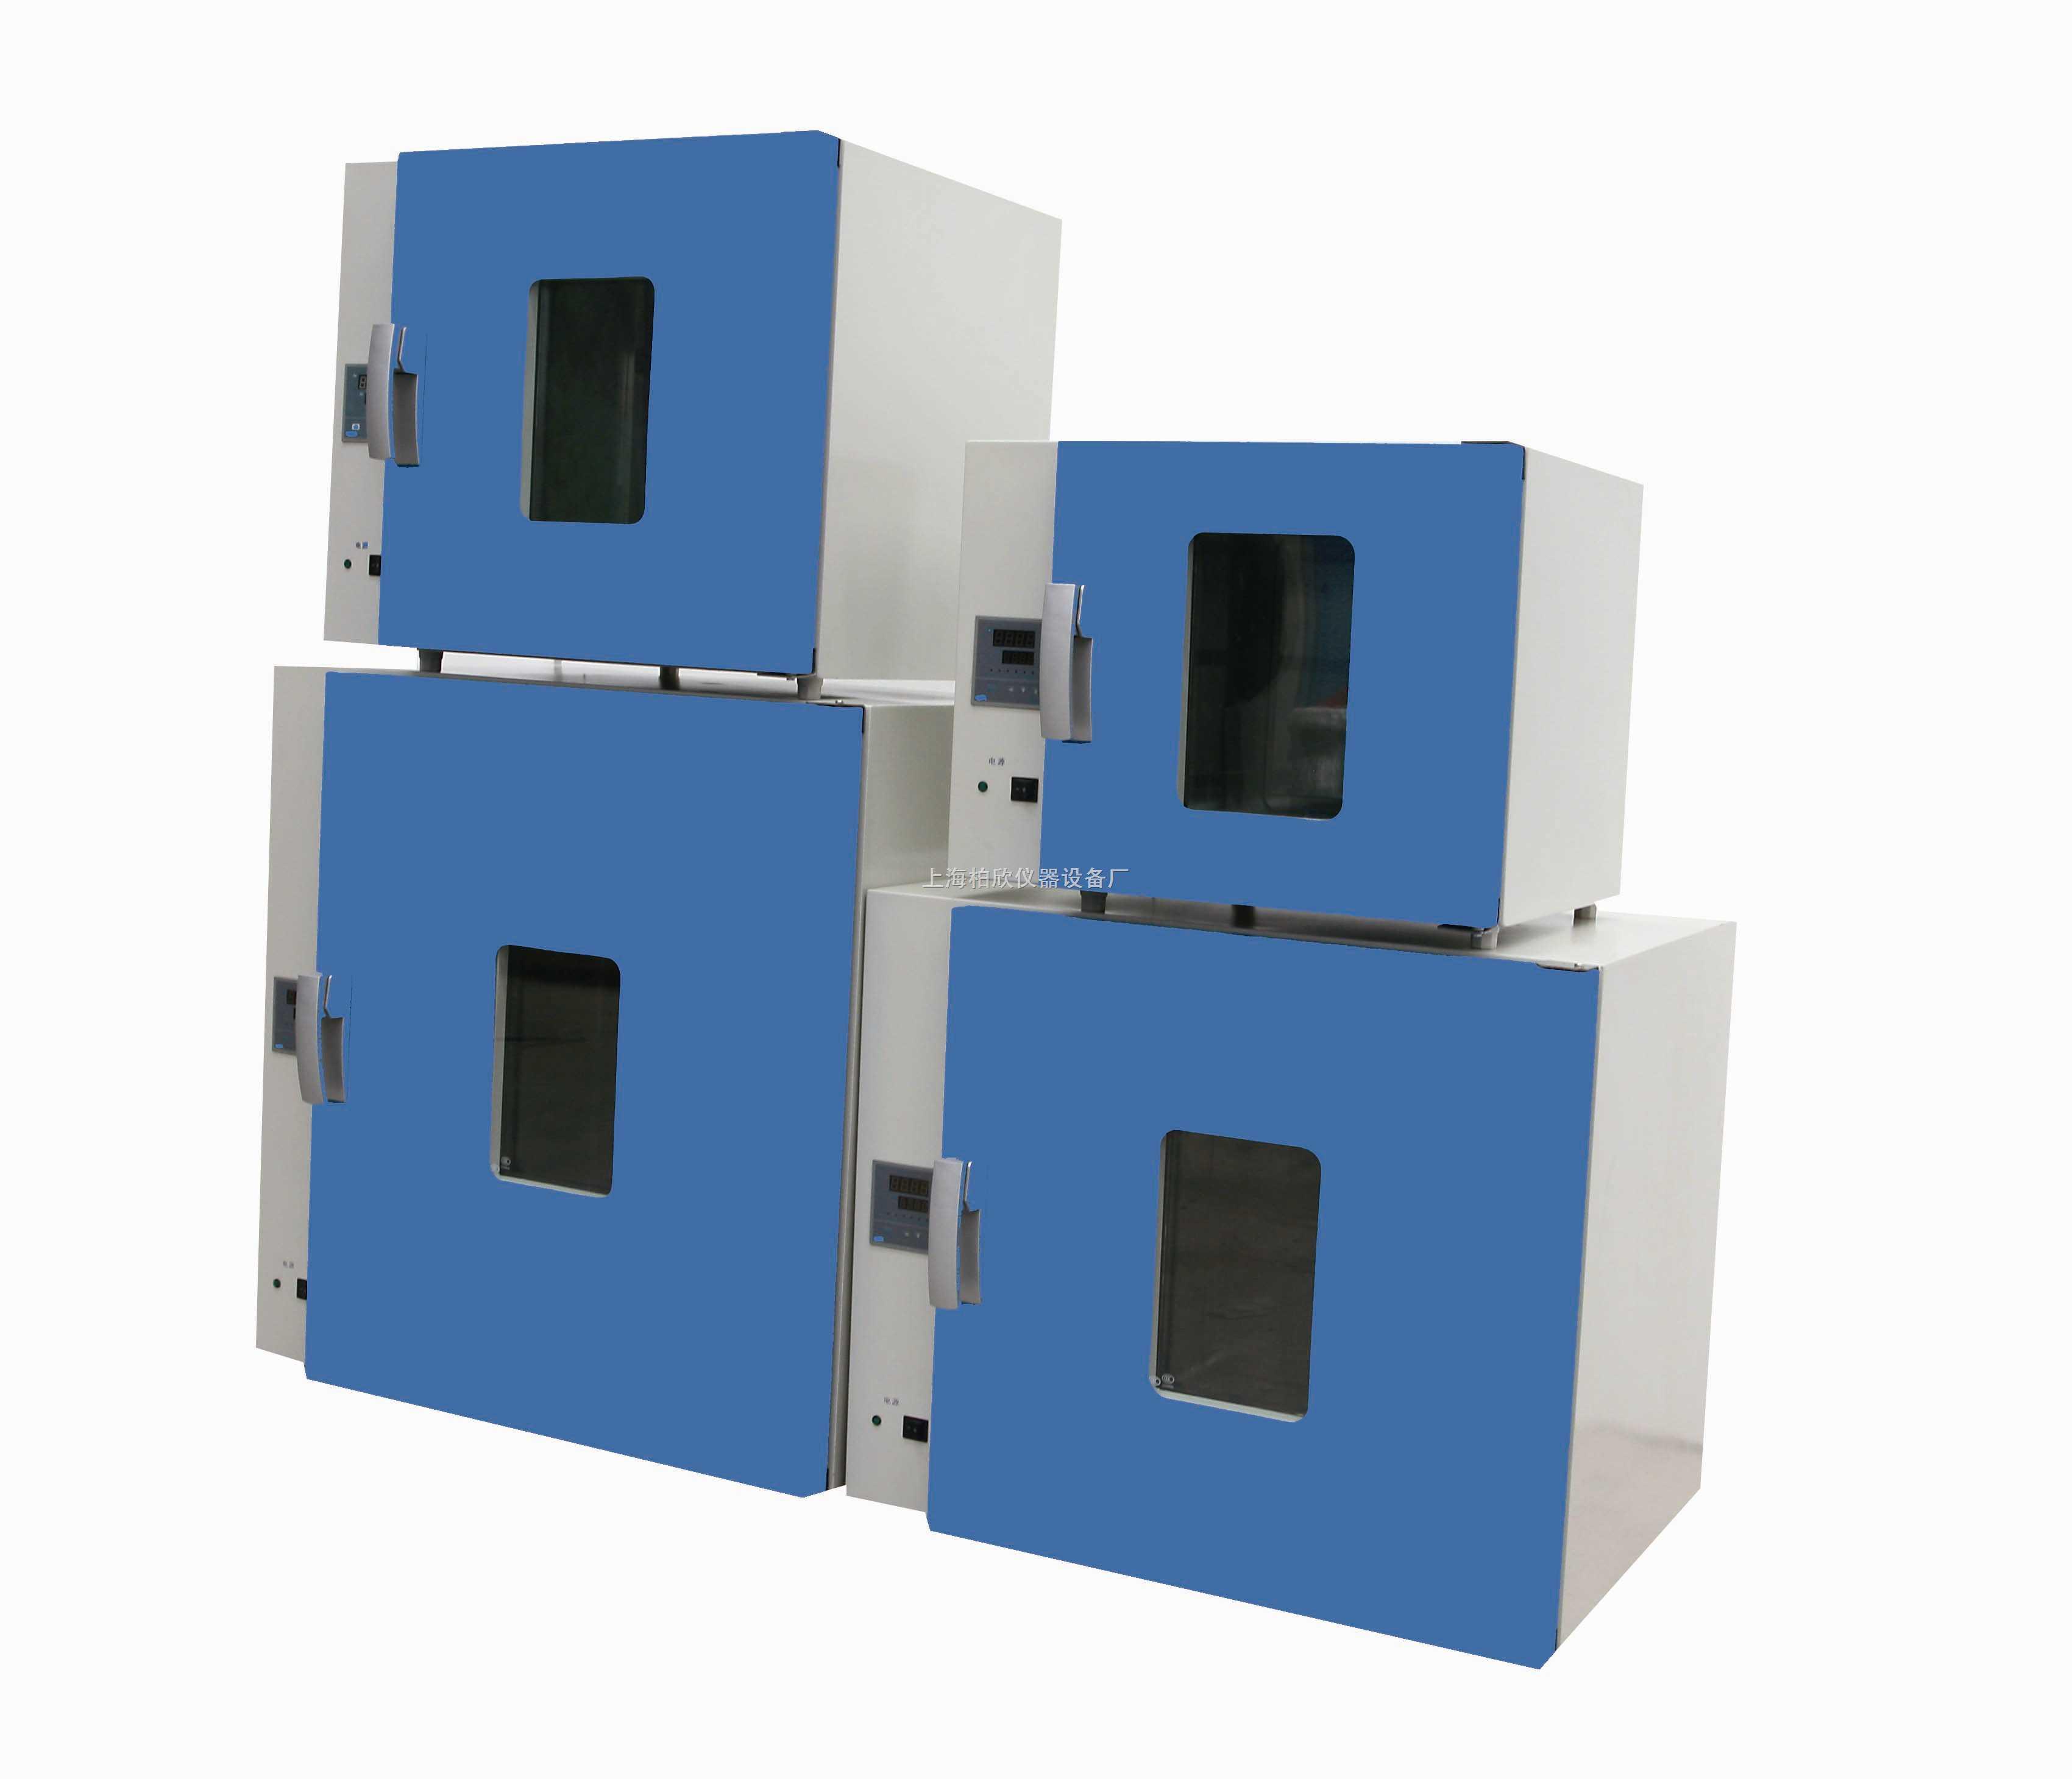 DHG-9140A台式250度电热恒温鼓风干燥箱 老化箱恒温箱 烘箱